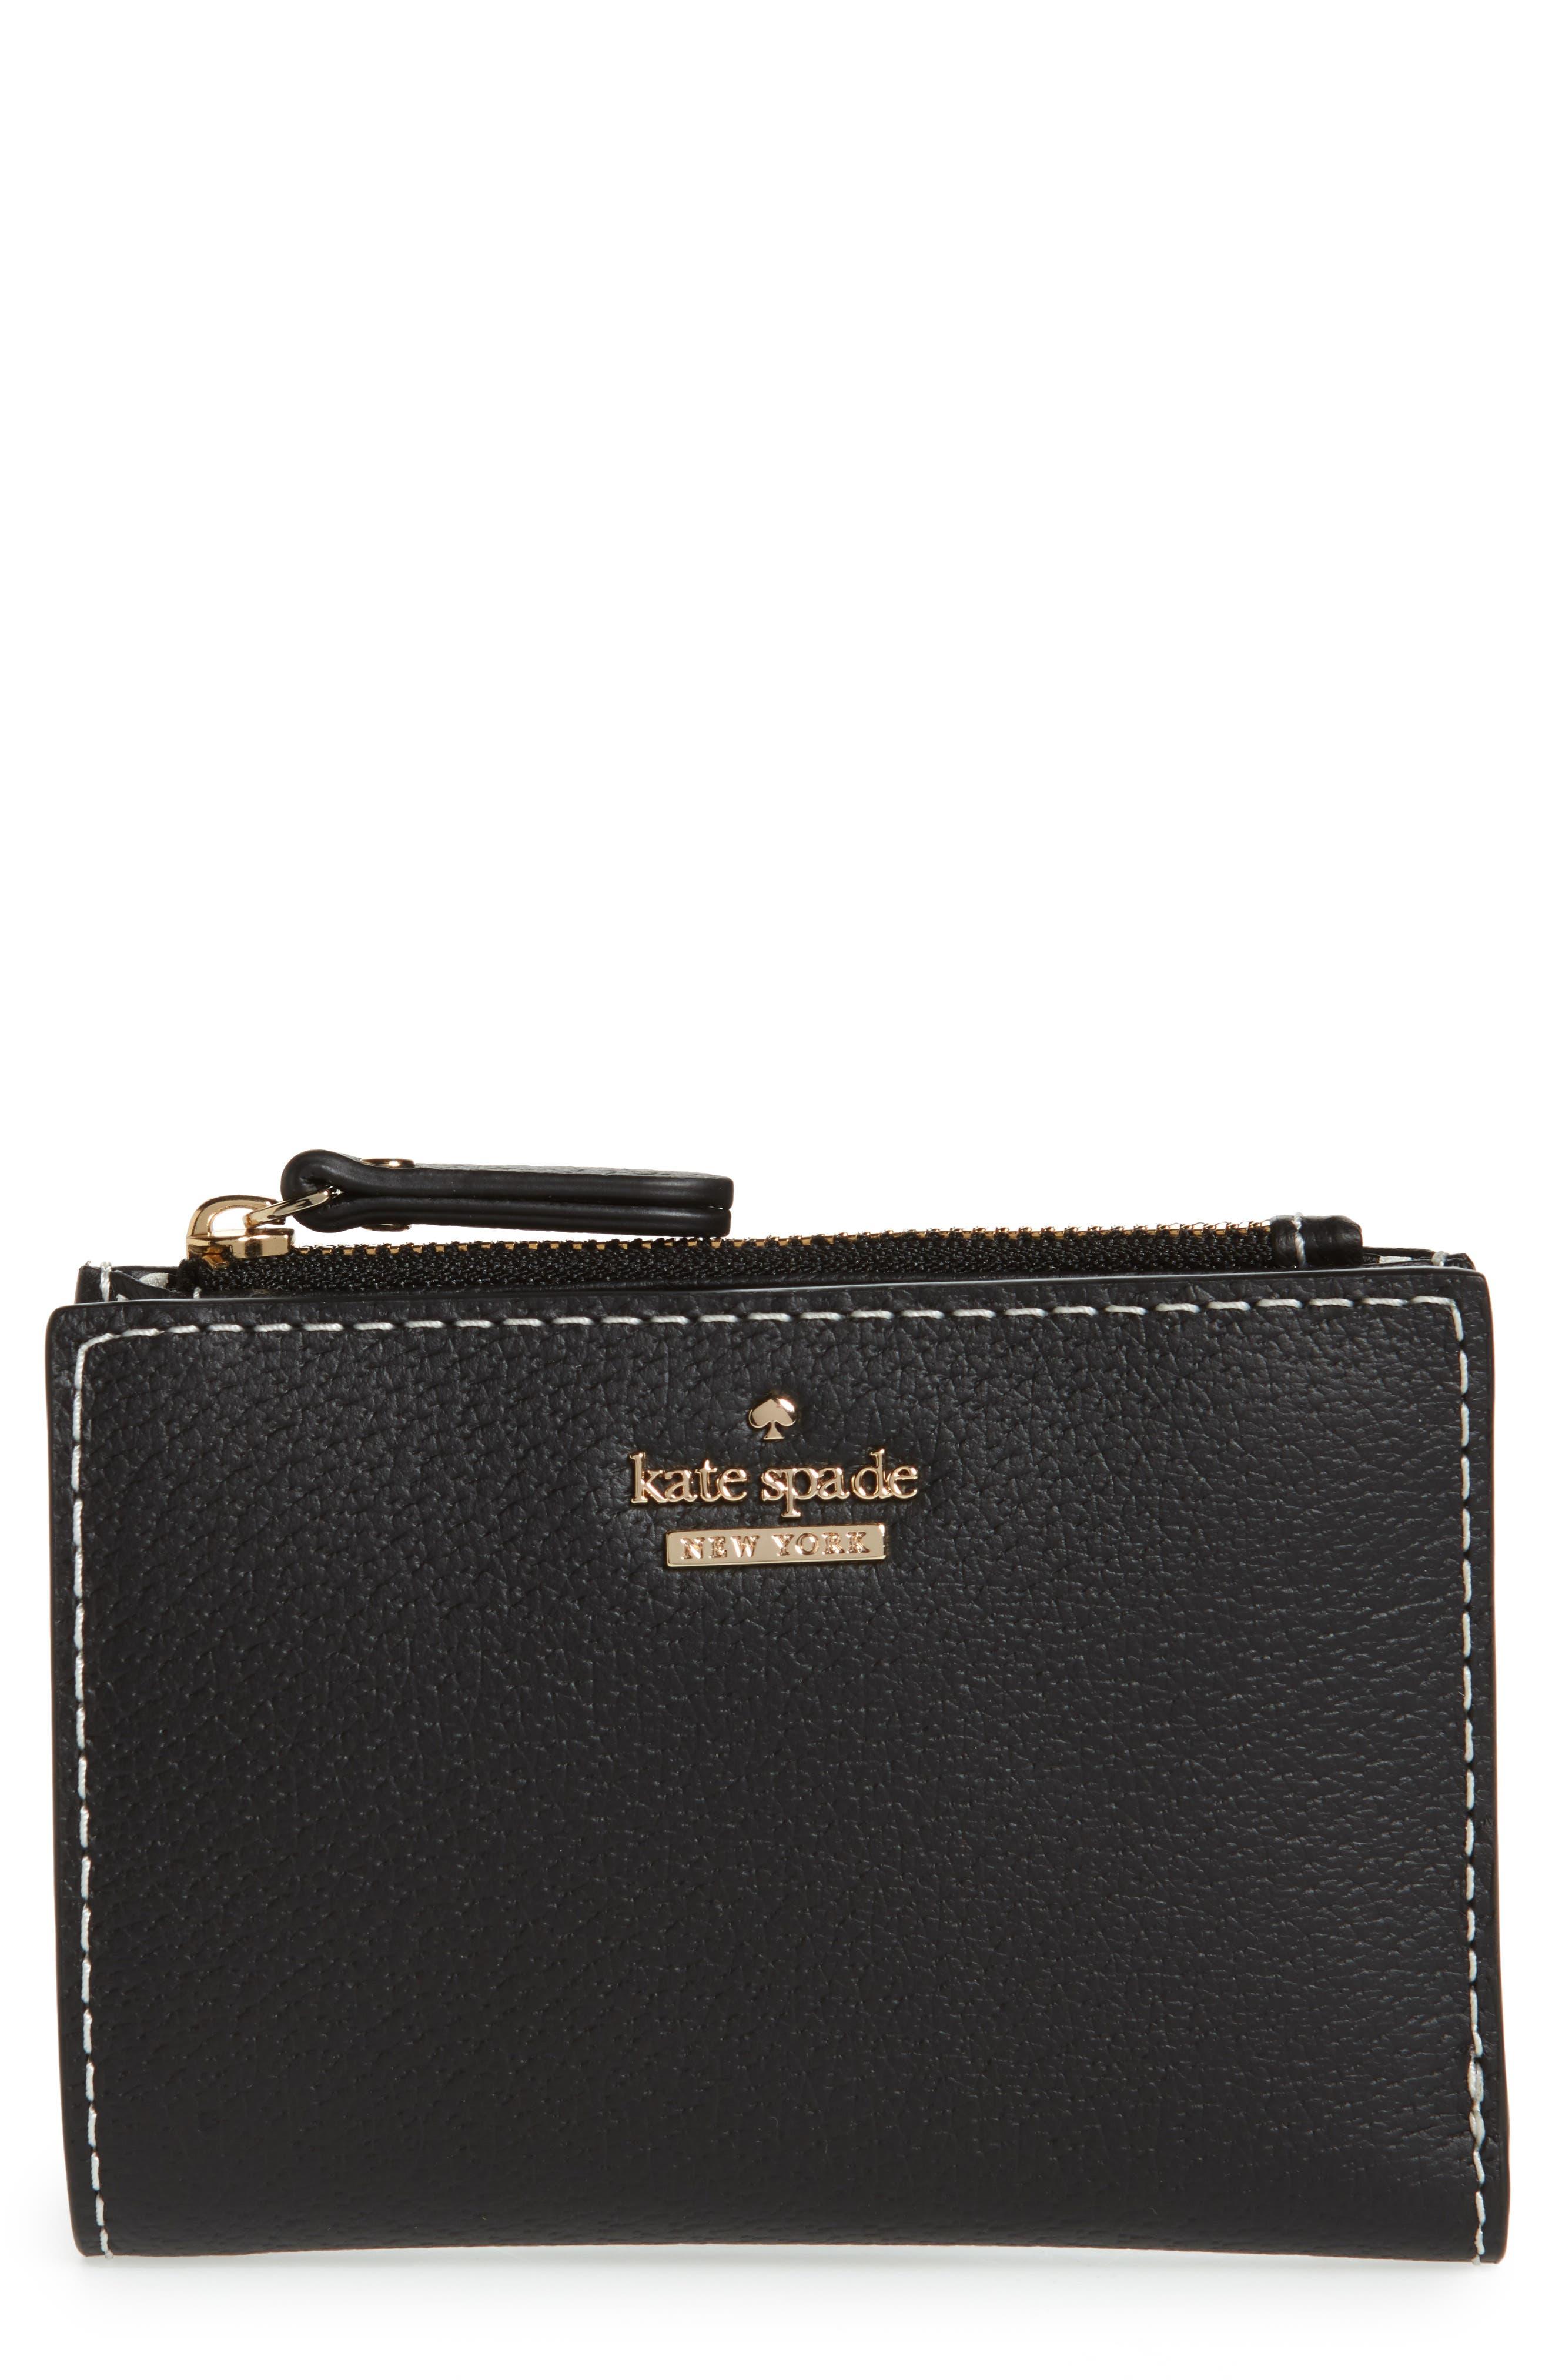 kate spade new york thompson street – abri leather wallet